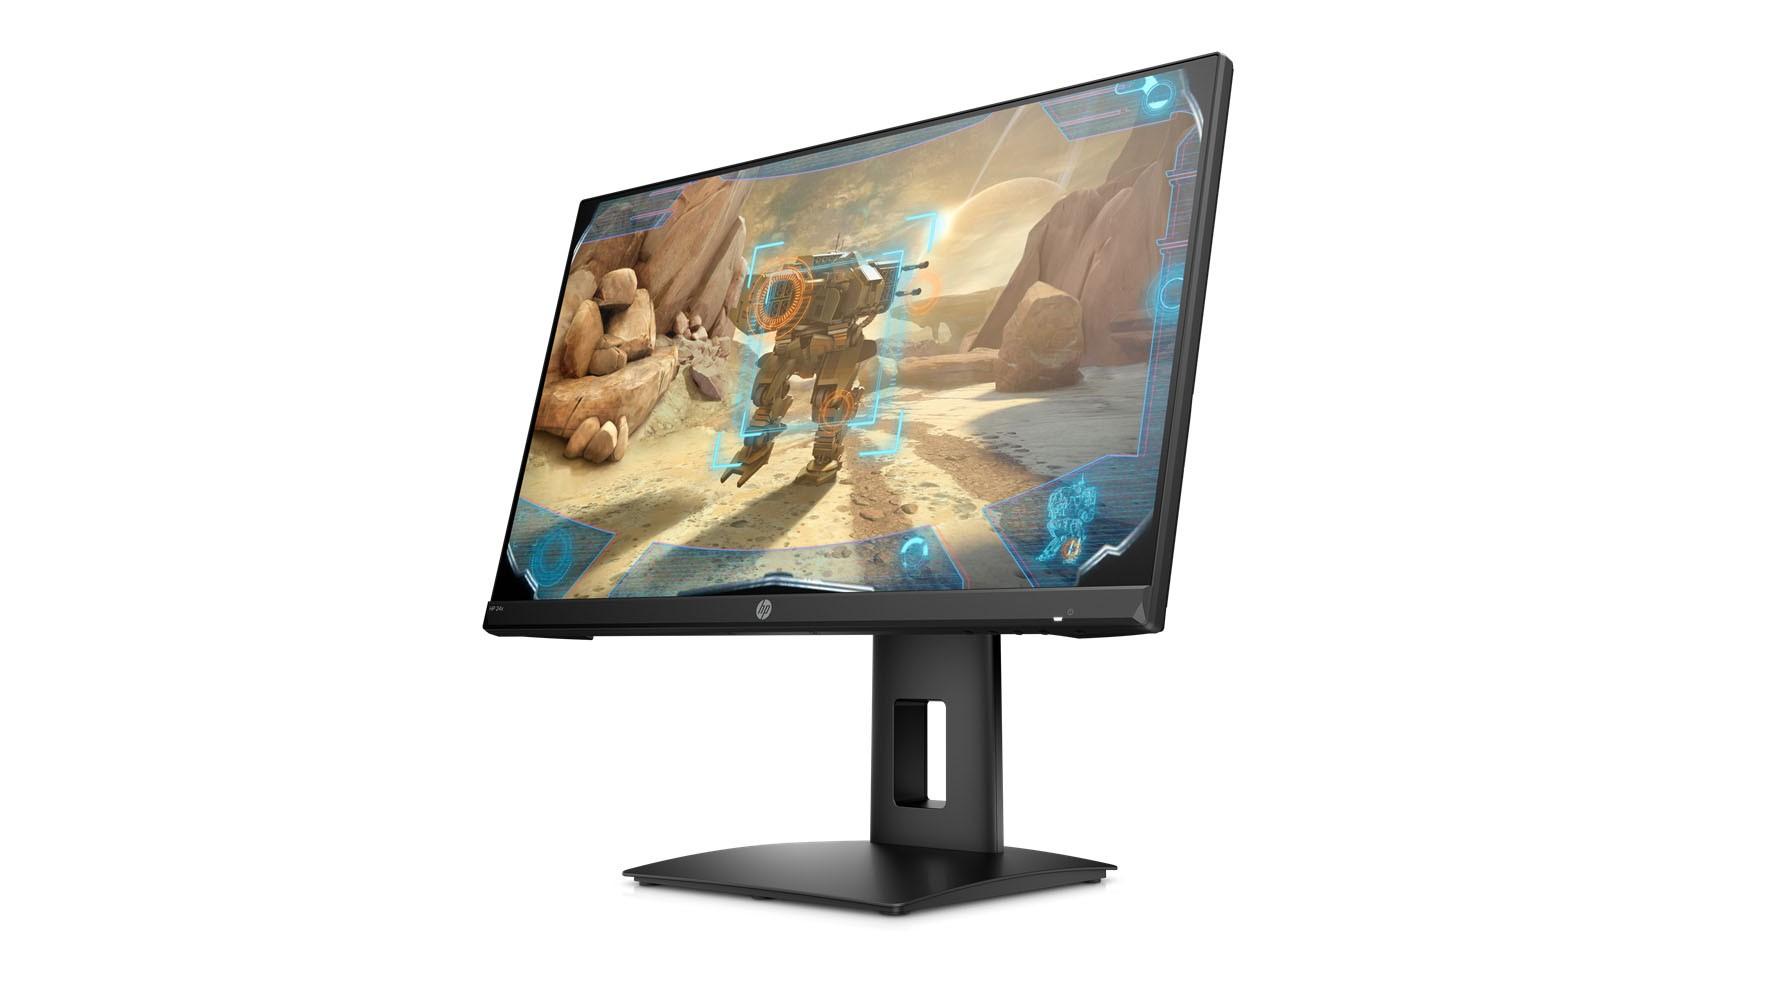 HP 24x Gaming Display